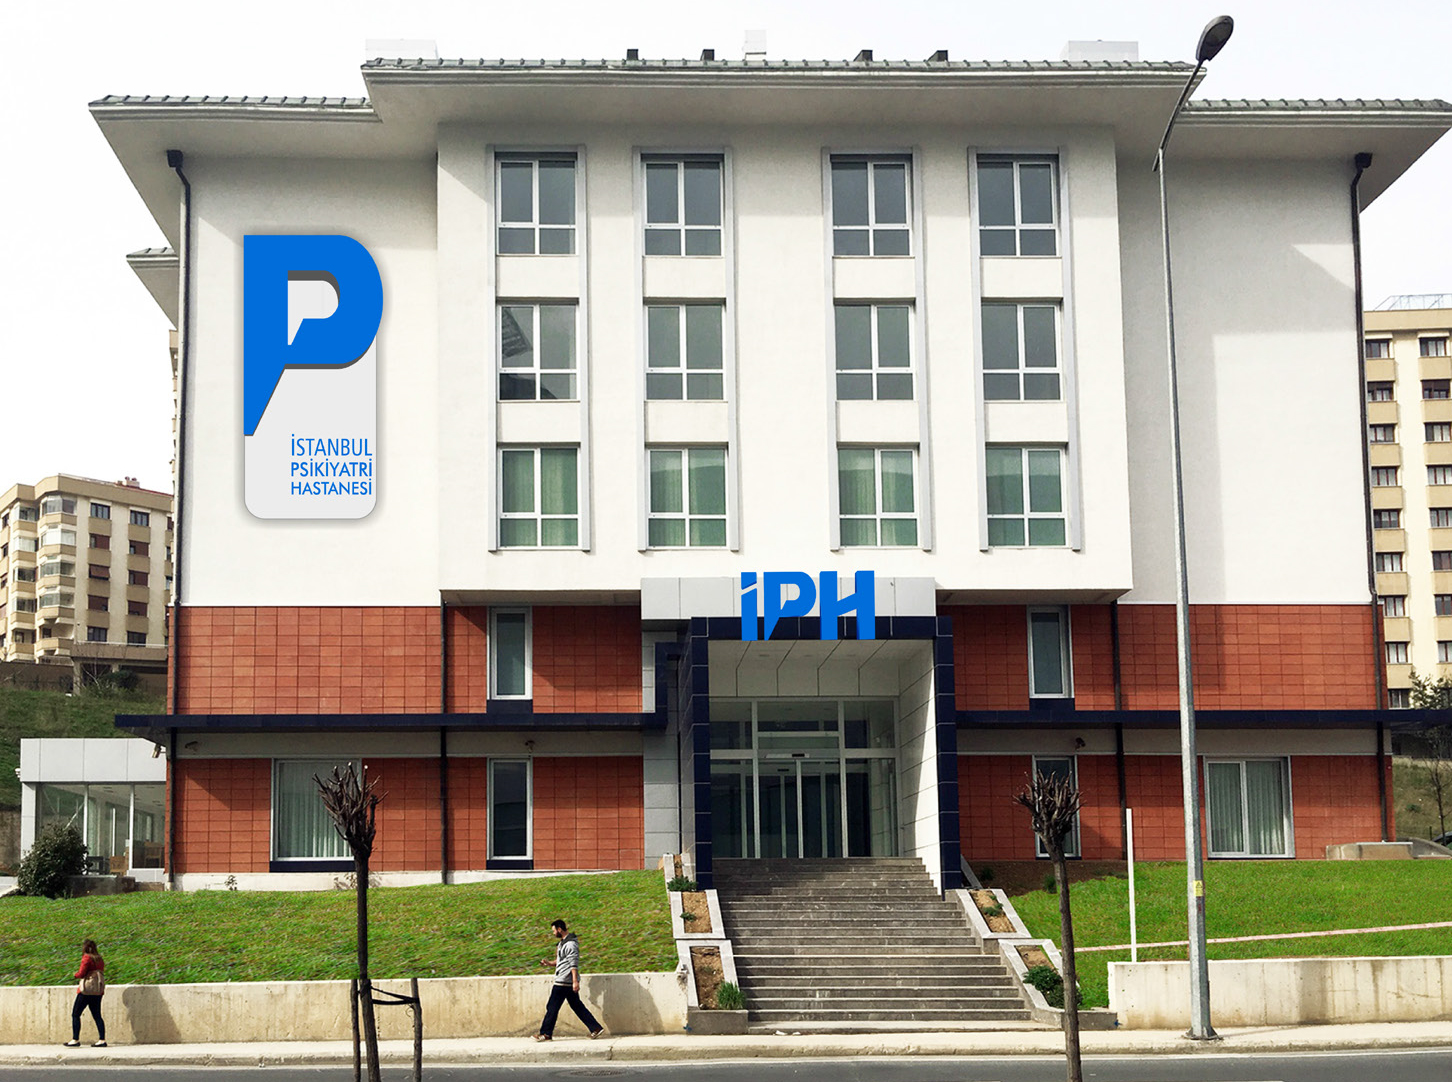 istanbul_psikiyatri_hastanesi